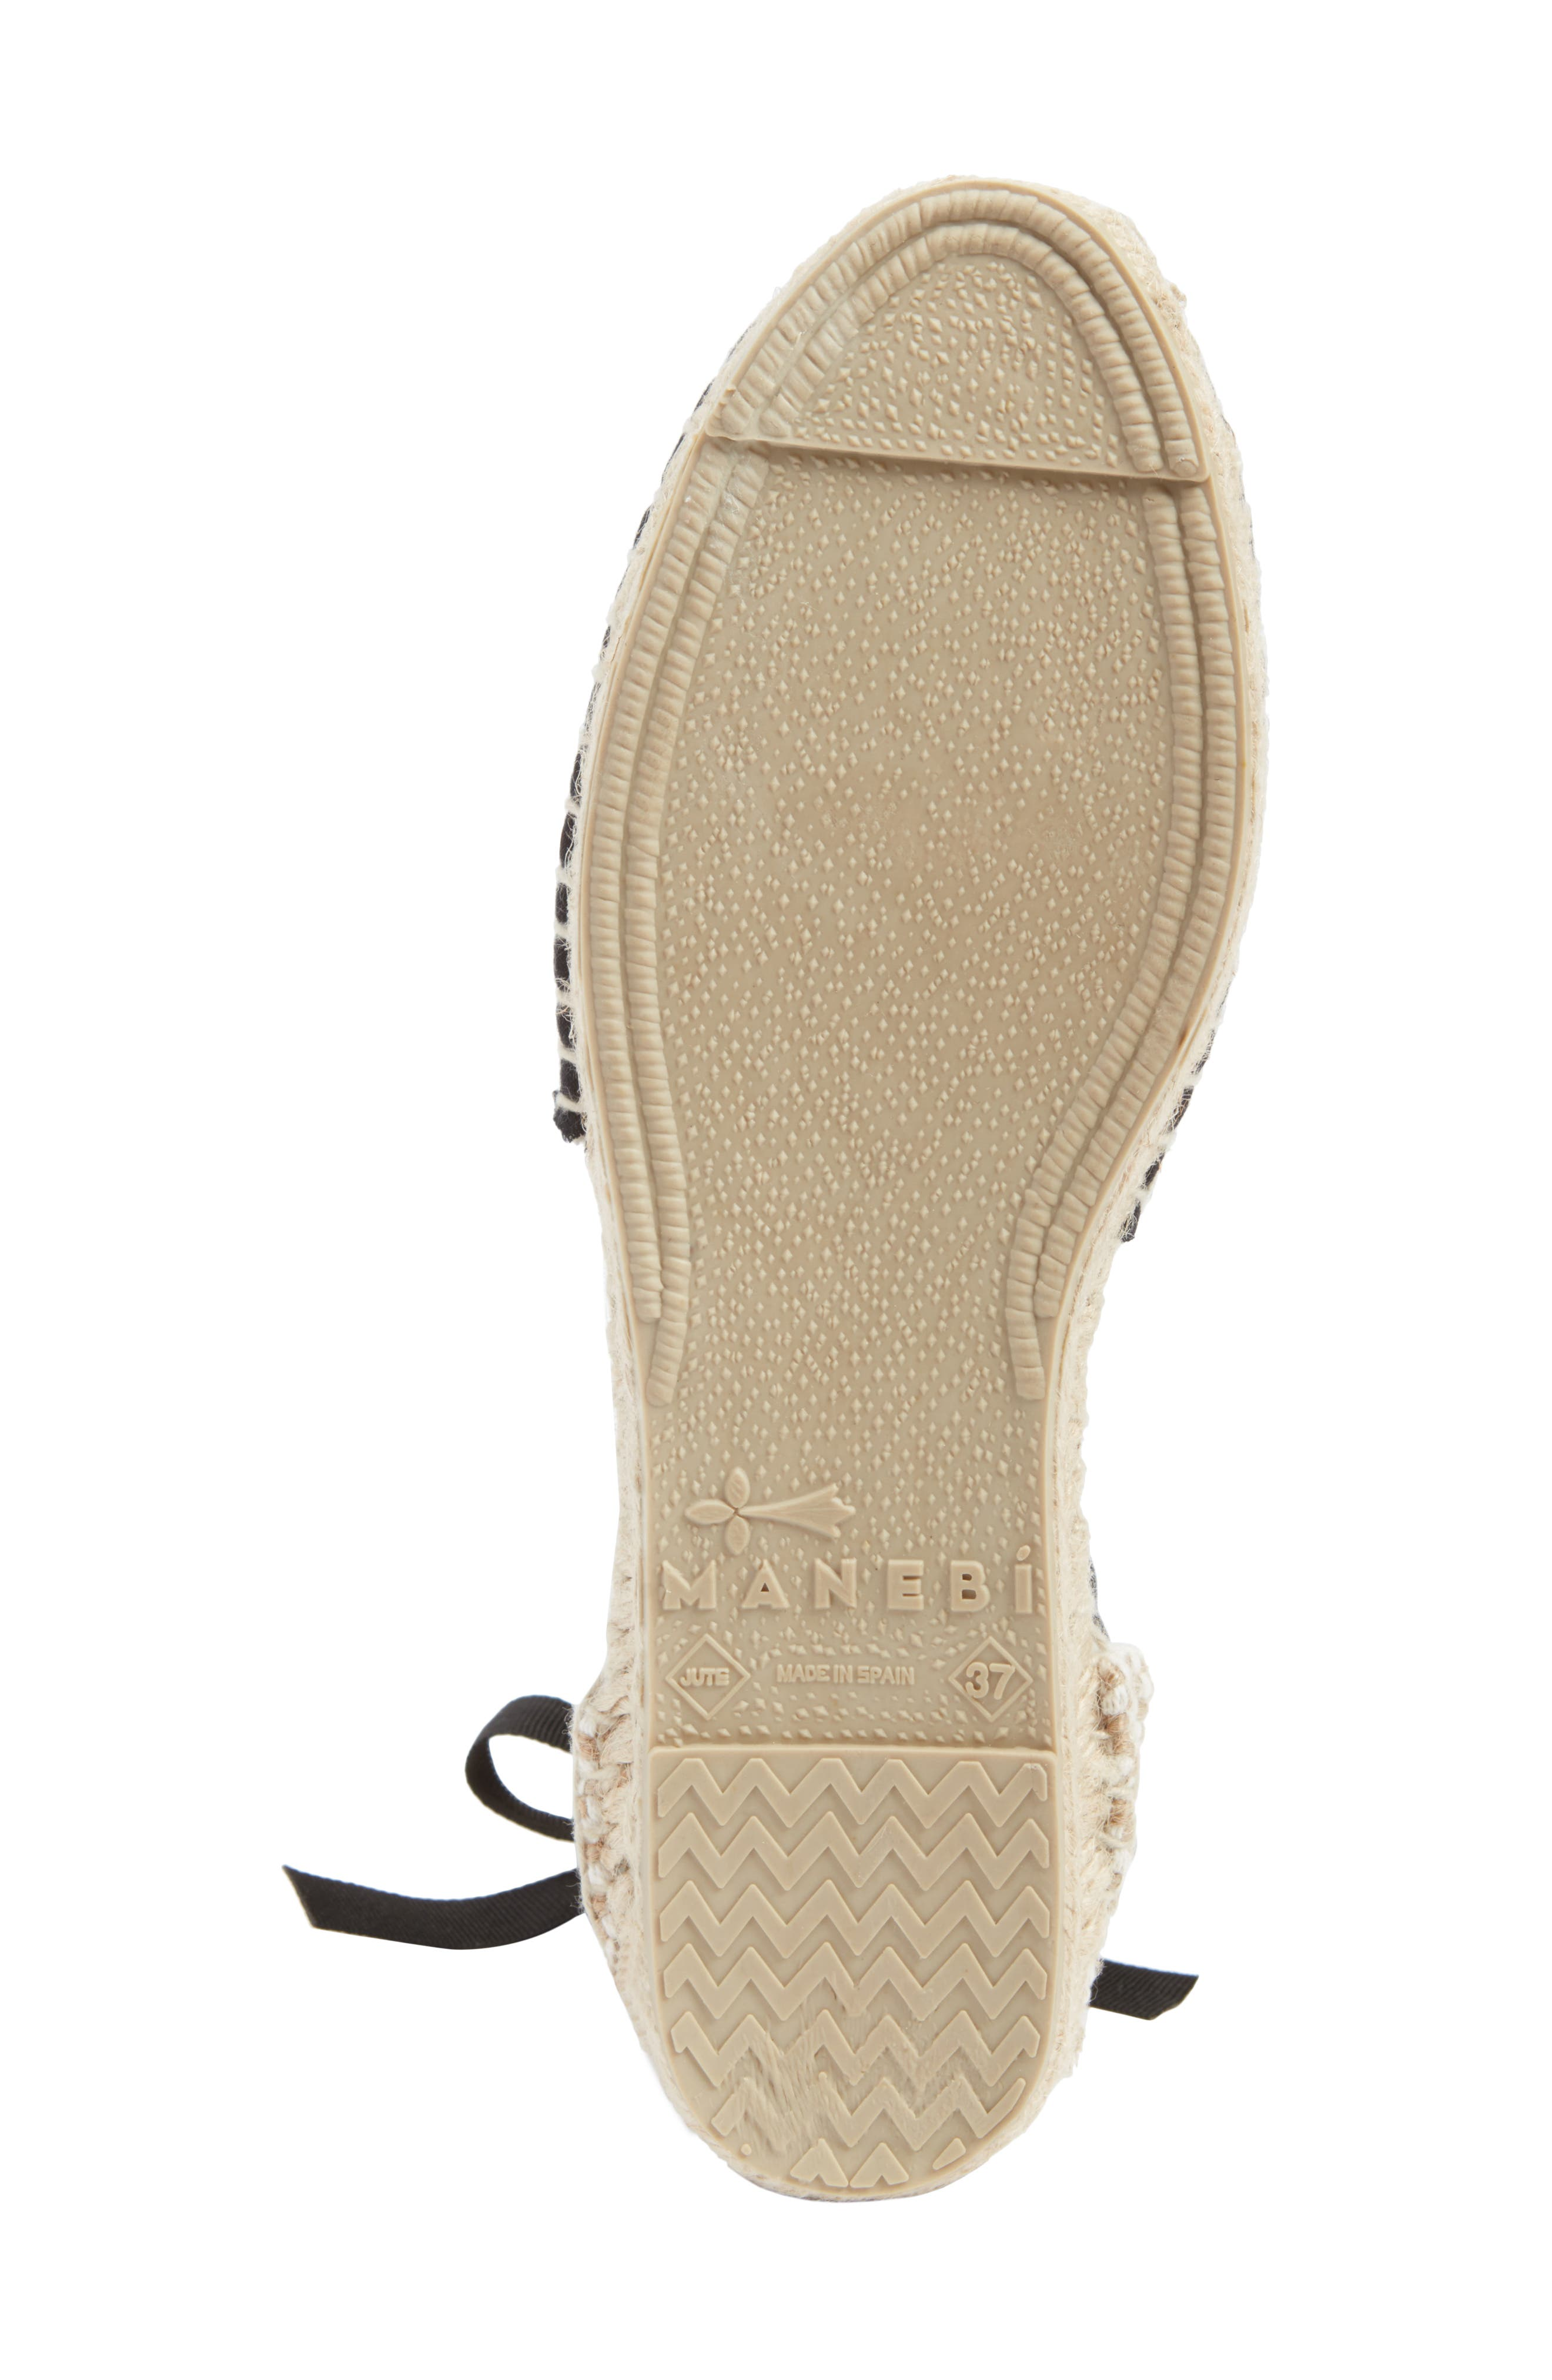 MANEBÍ Rajasthan Espadrille Sandal,                             Alternate thumbnail 6, color,                             Indian Fabric